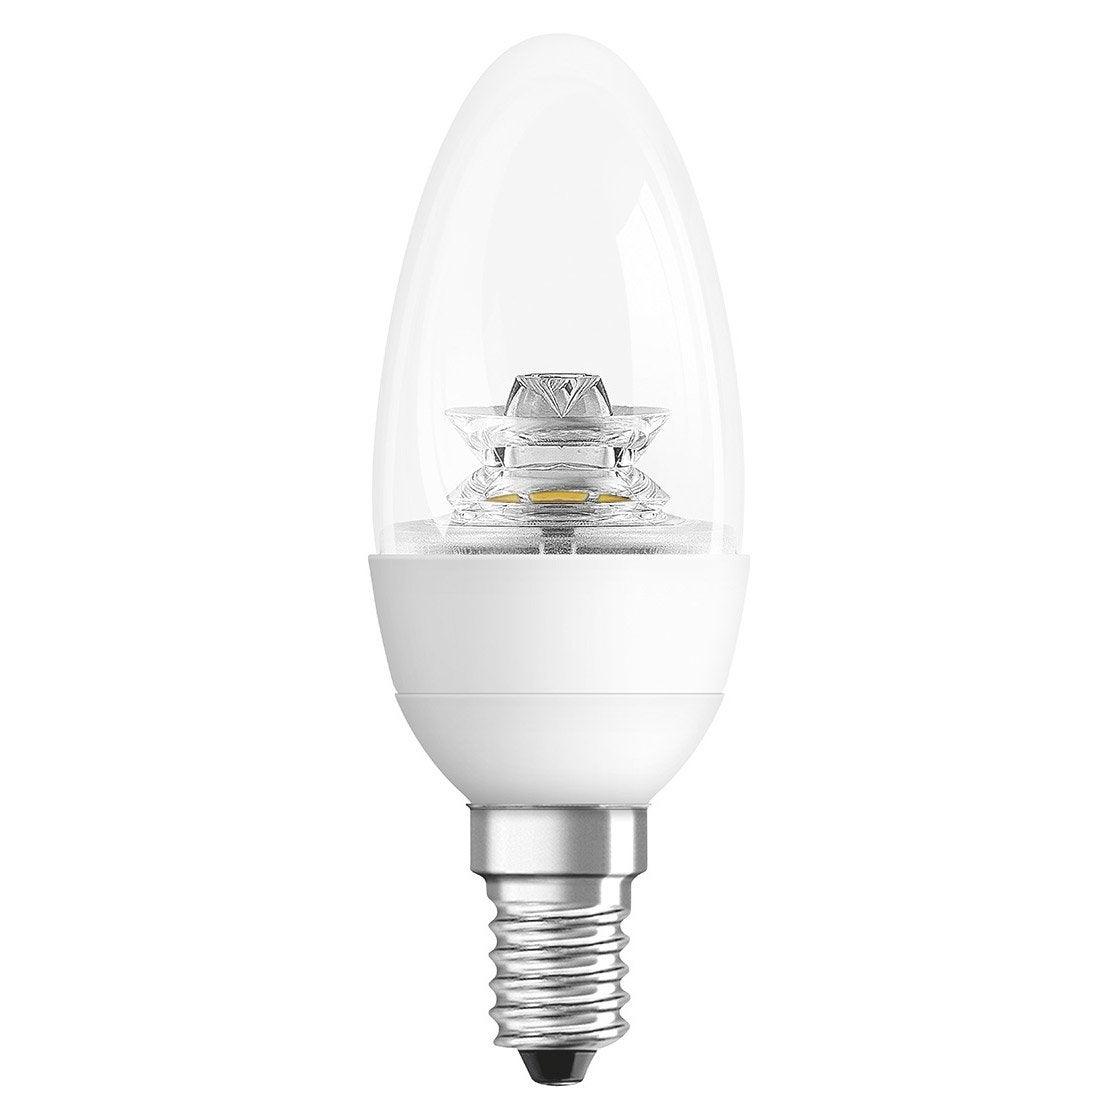 Ampoule Flamme Led 6w Osram E14 Lumi Re Chaude Env 2700k Leroy Merlin